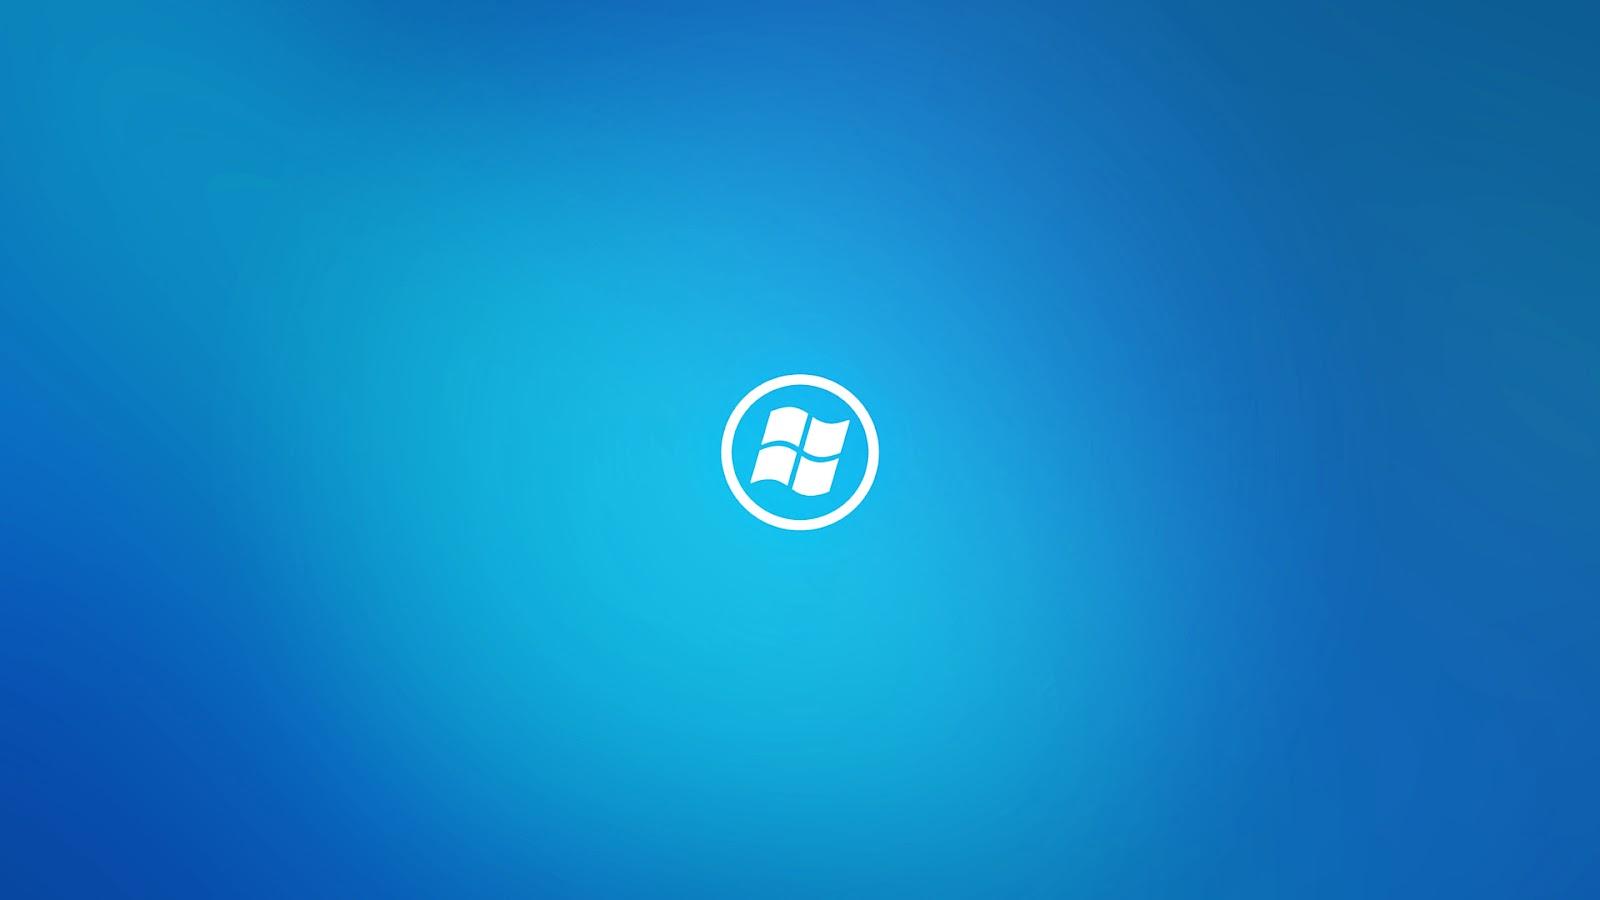 43 Windows 10 Wallpapers And Themes On Wallpapersafari